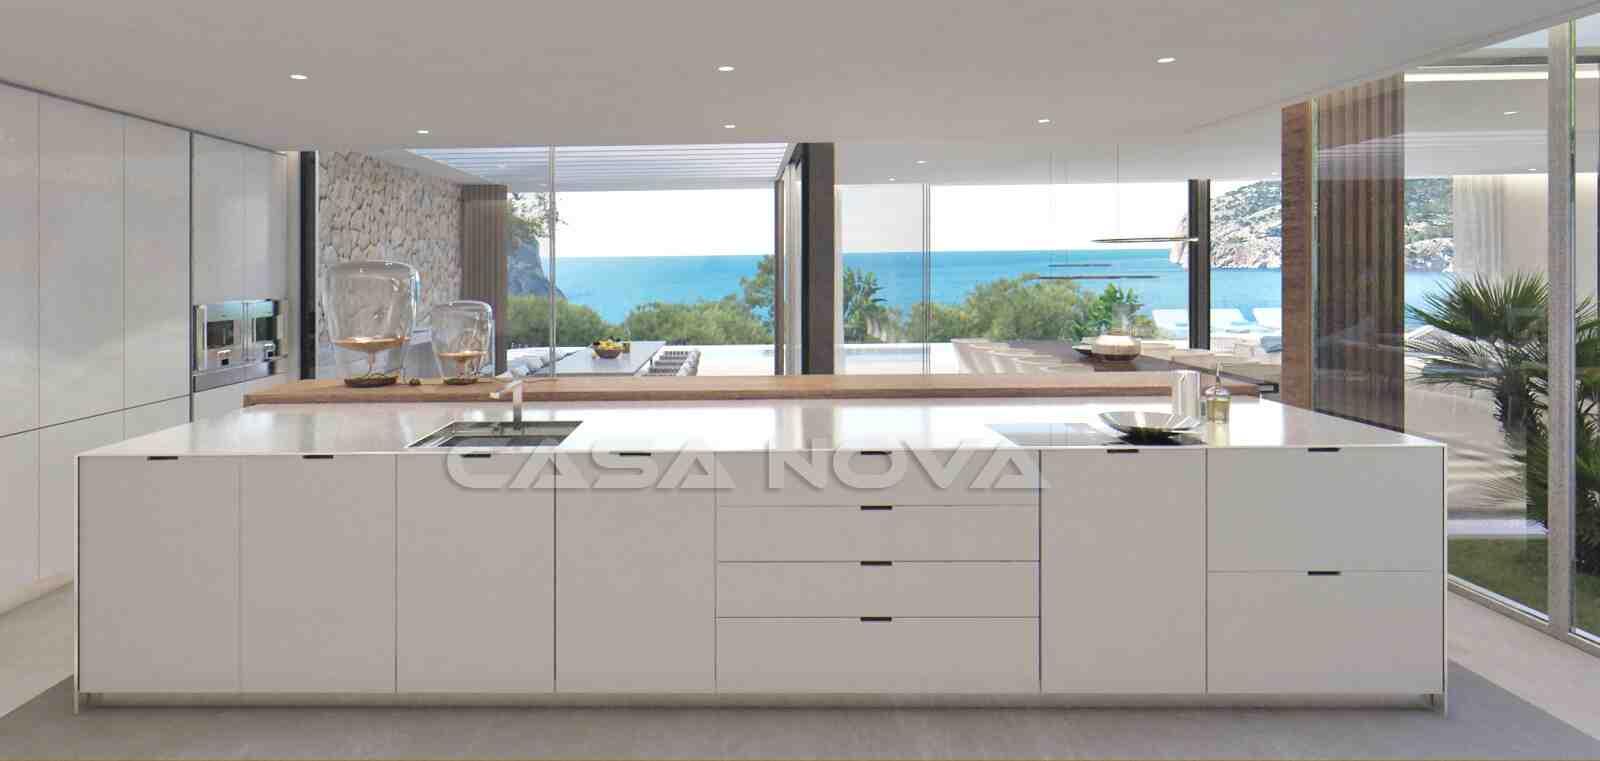 Tolles Bauprojekt - Mallorca Grundstück in bester Lage